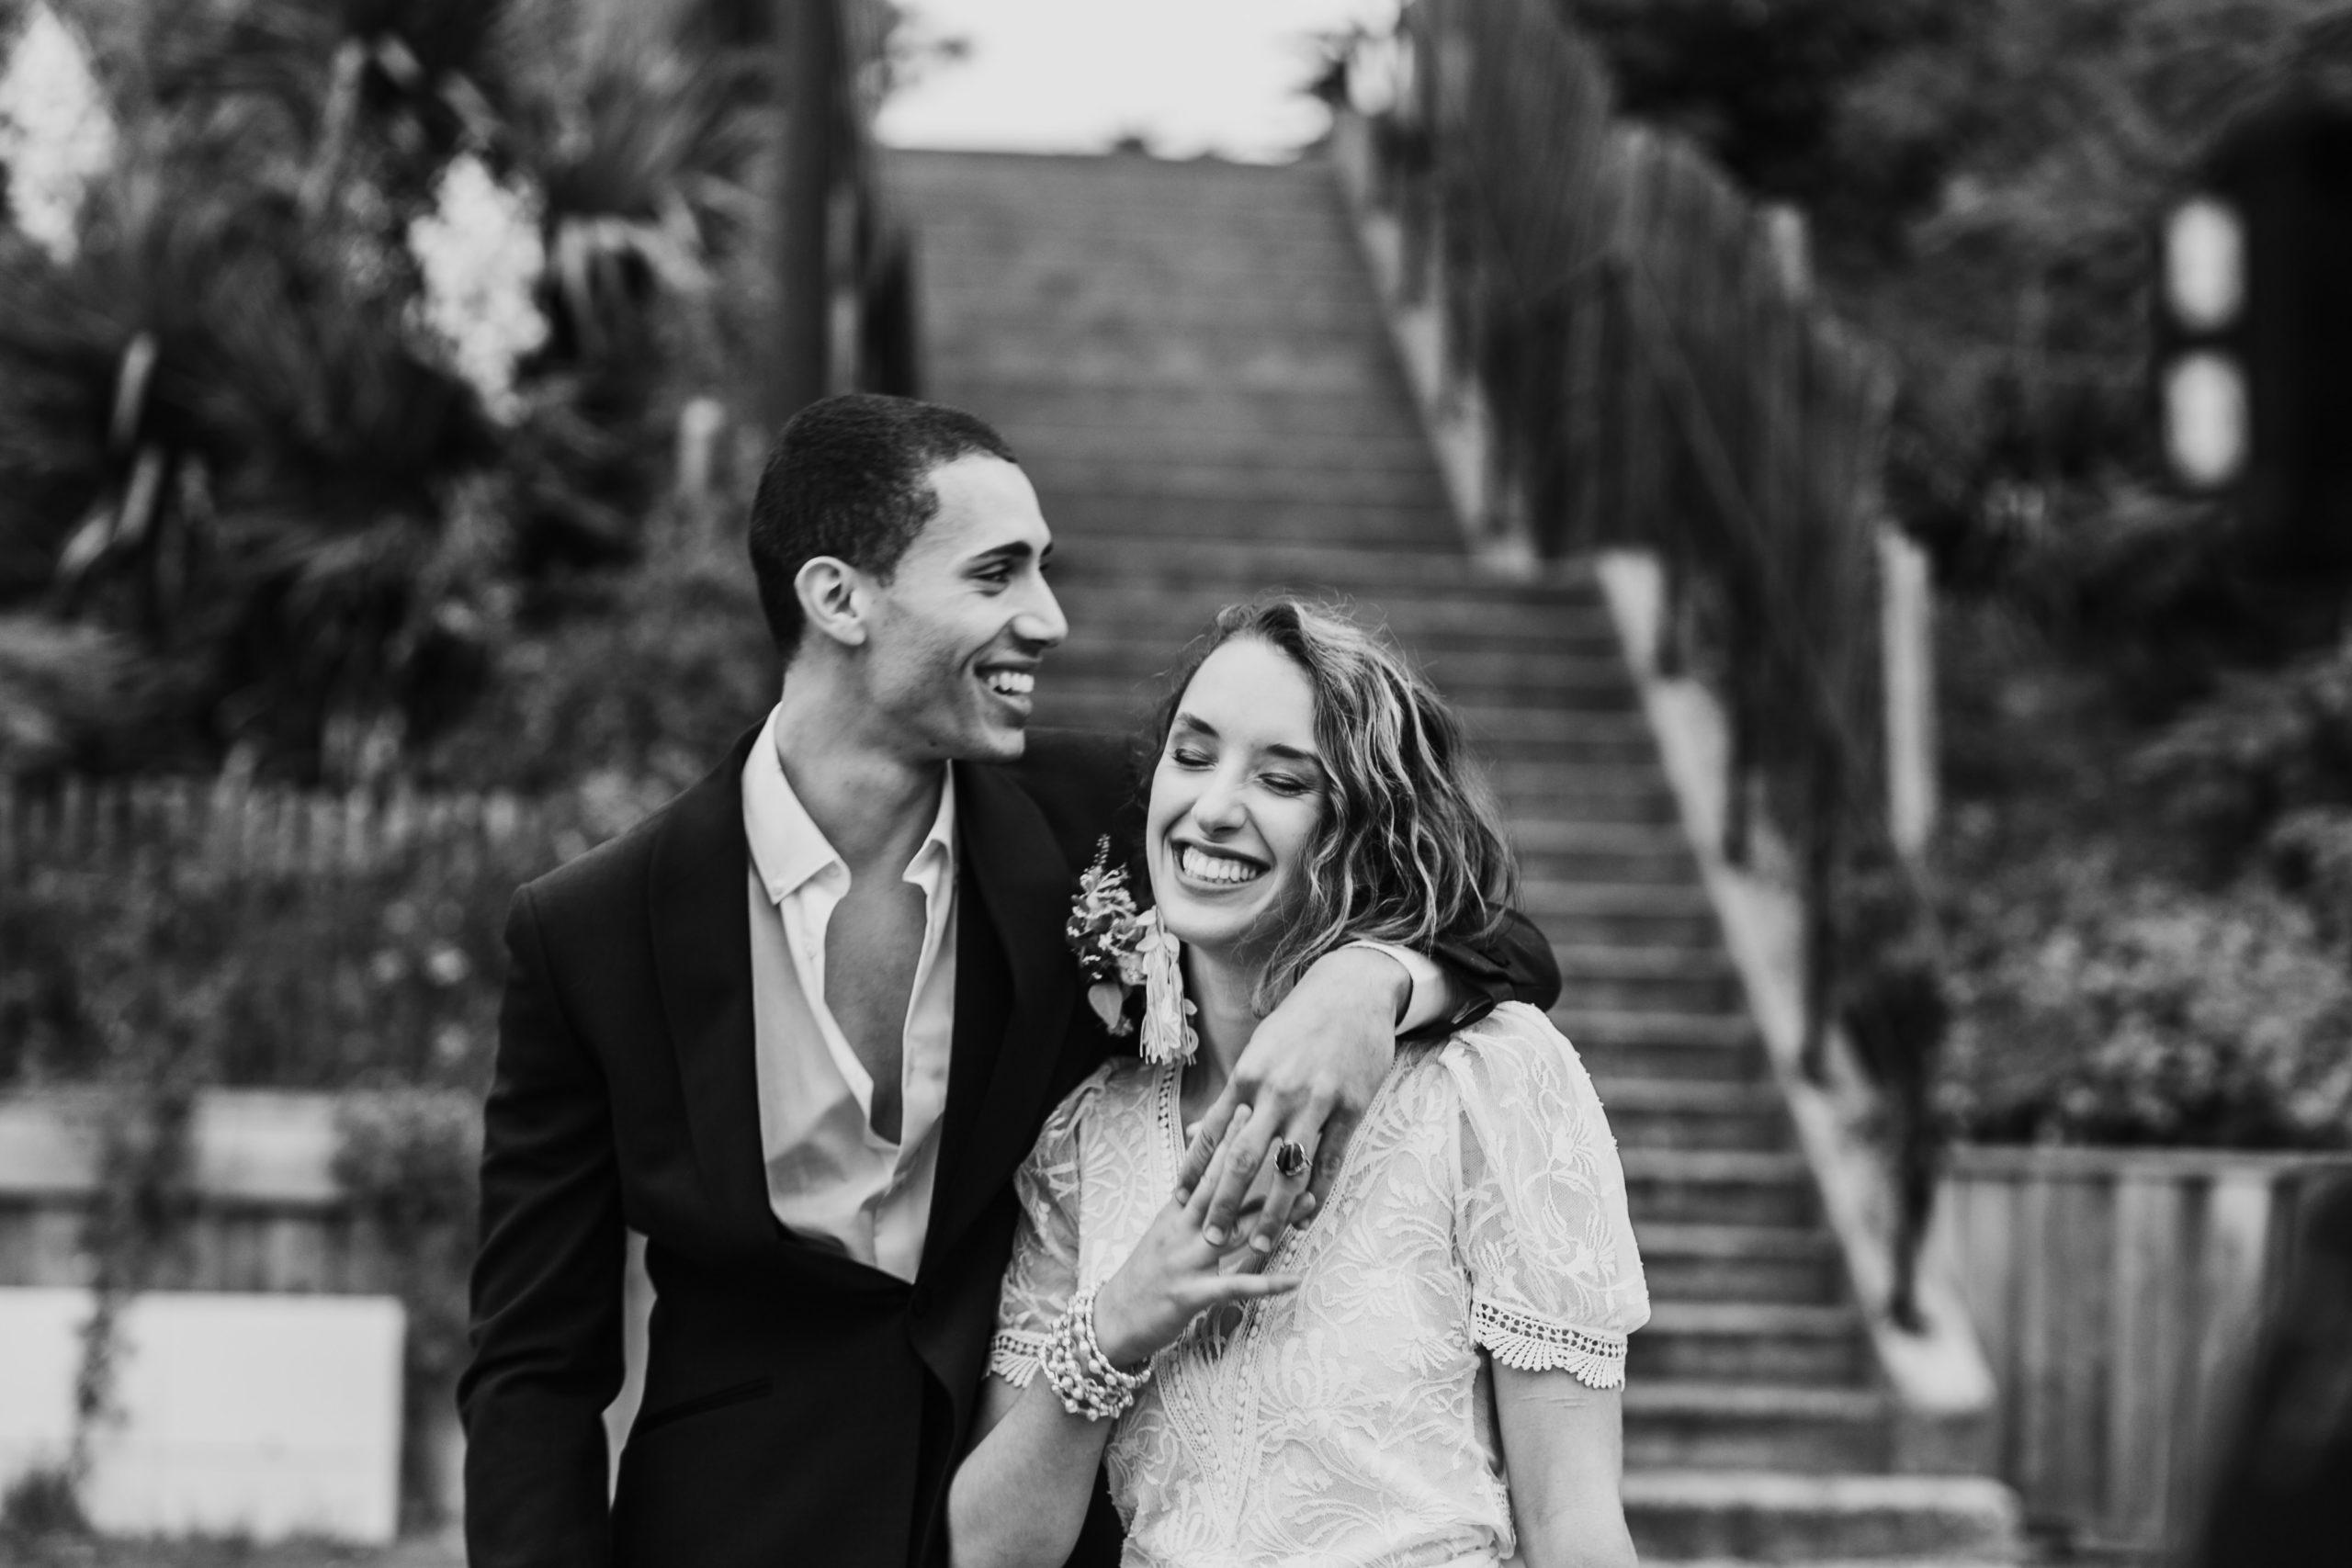 tarifs couple photographe - prestation photographe mariage